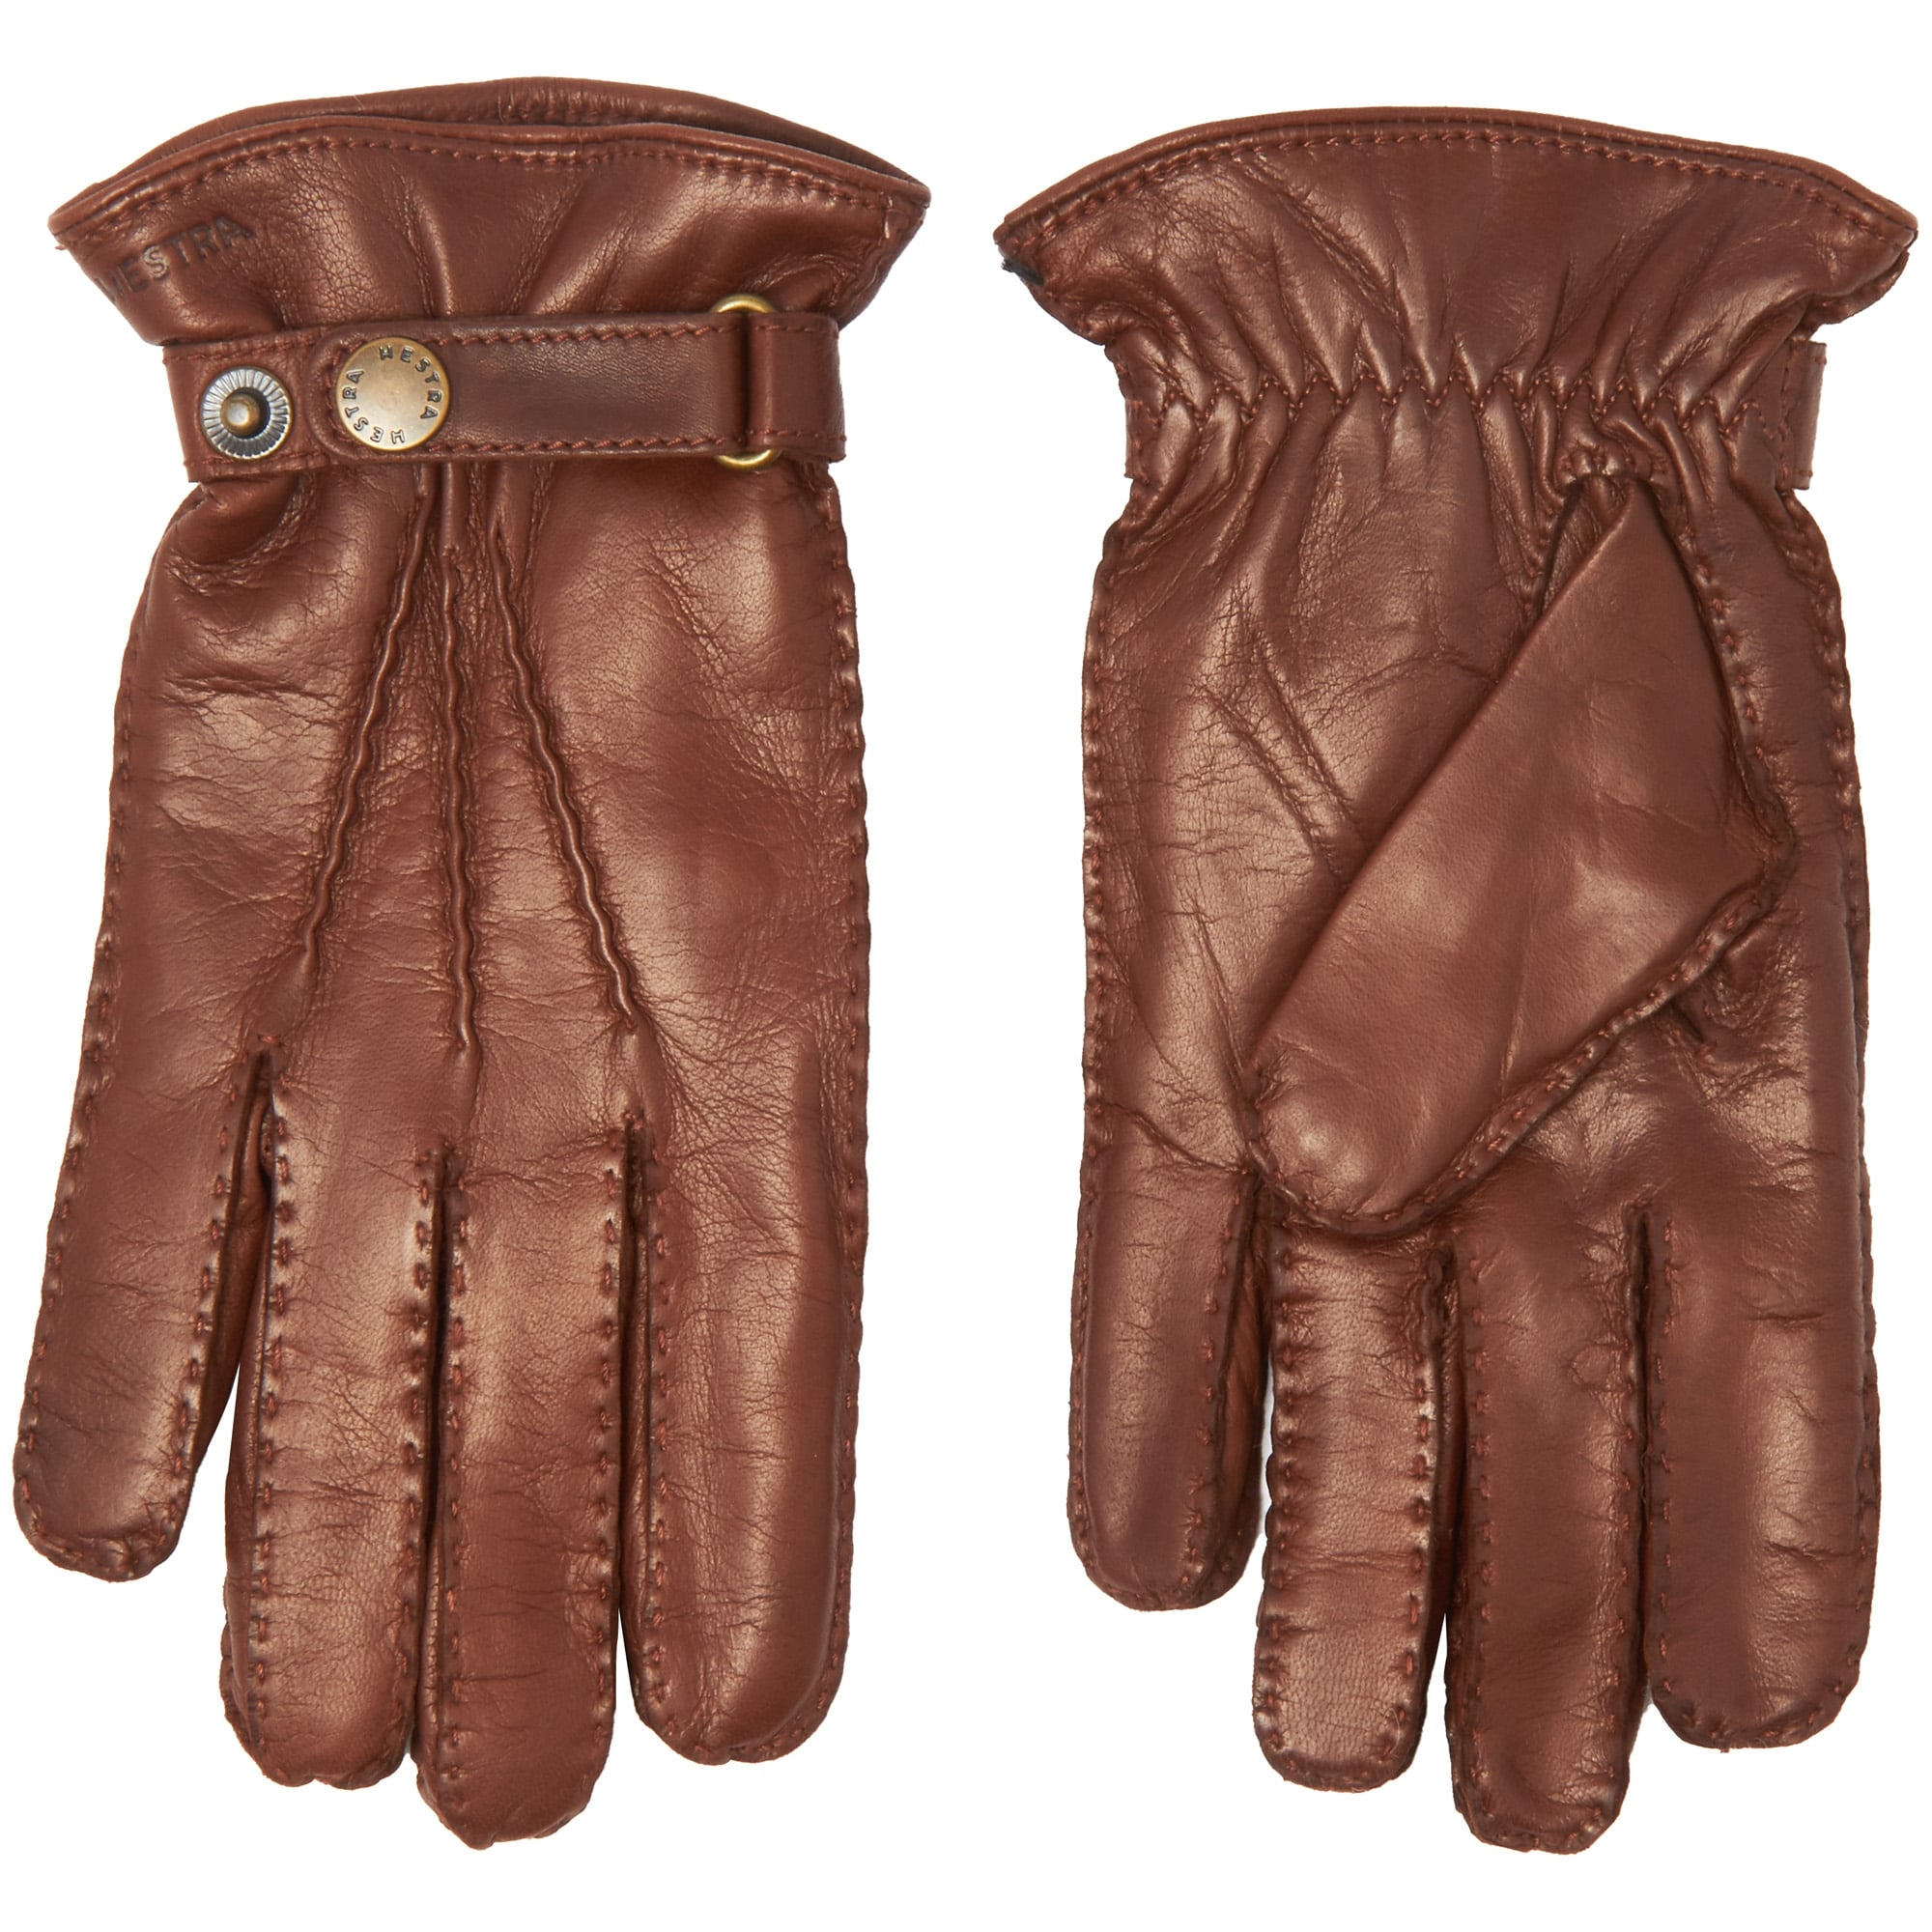 Hestra glove sizes uk